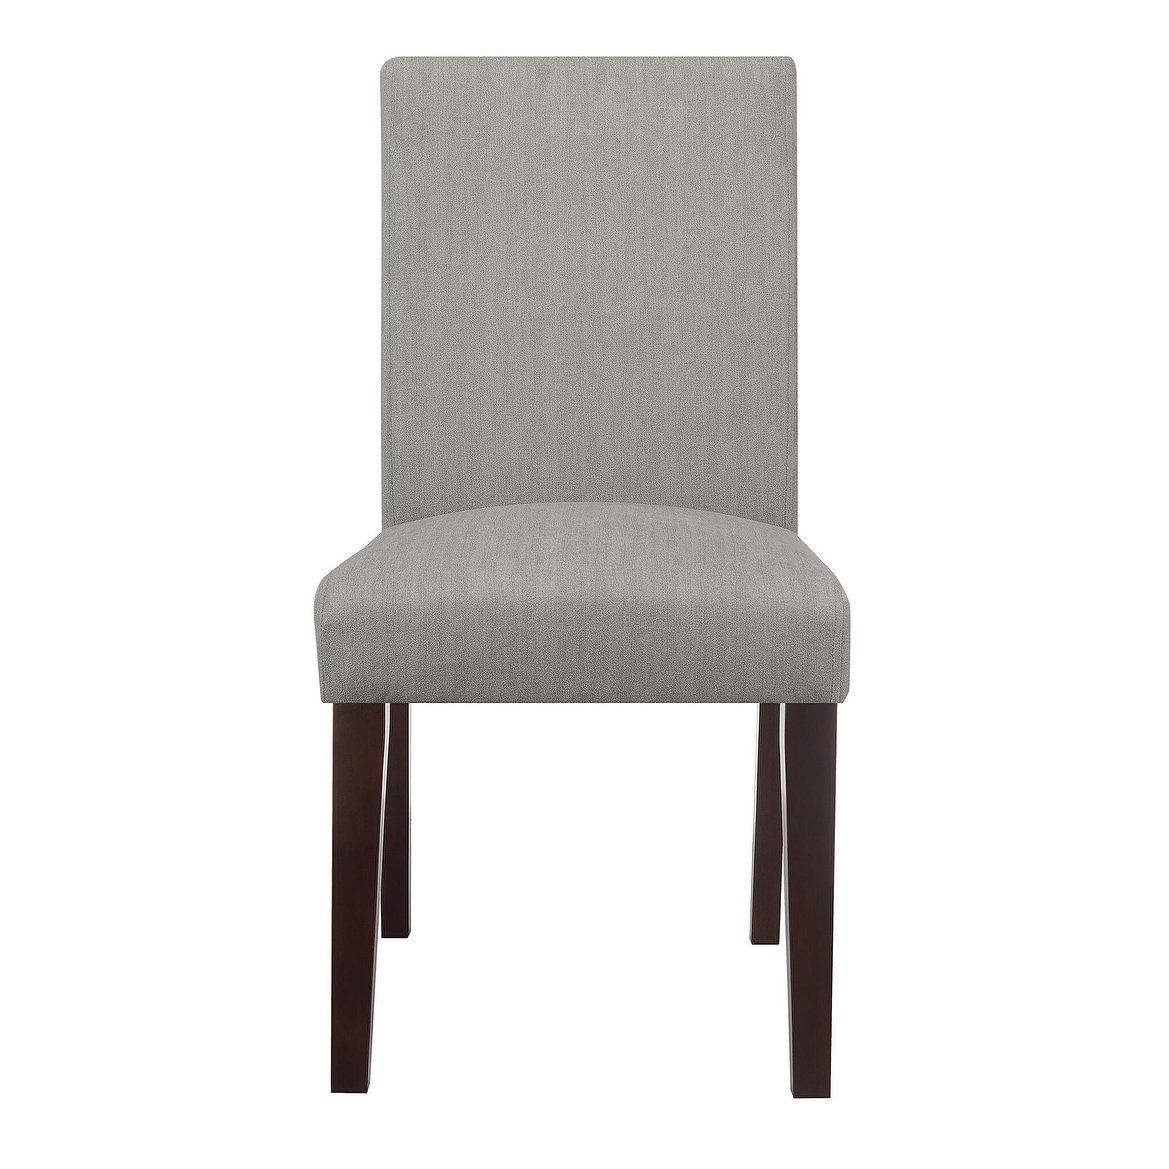 Serta Liam Dining Chair Set Of 2